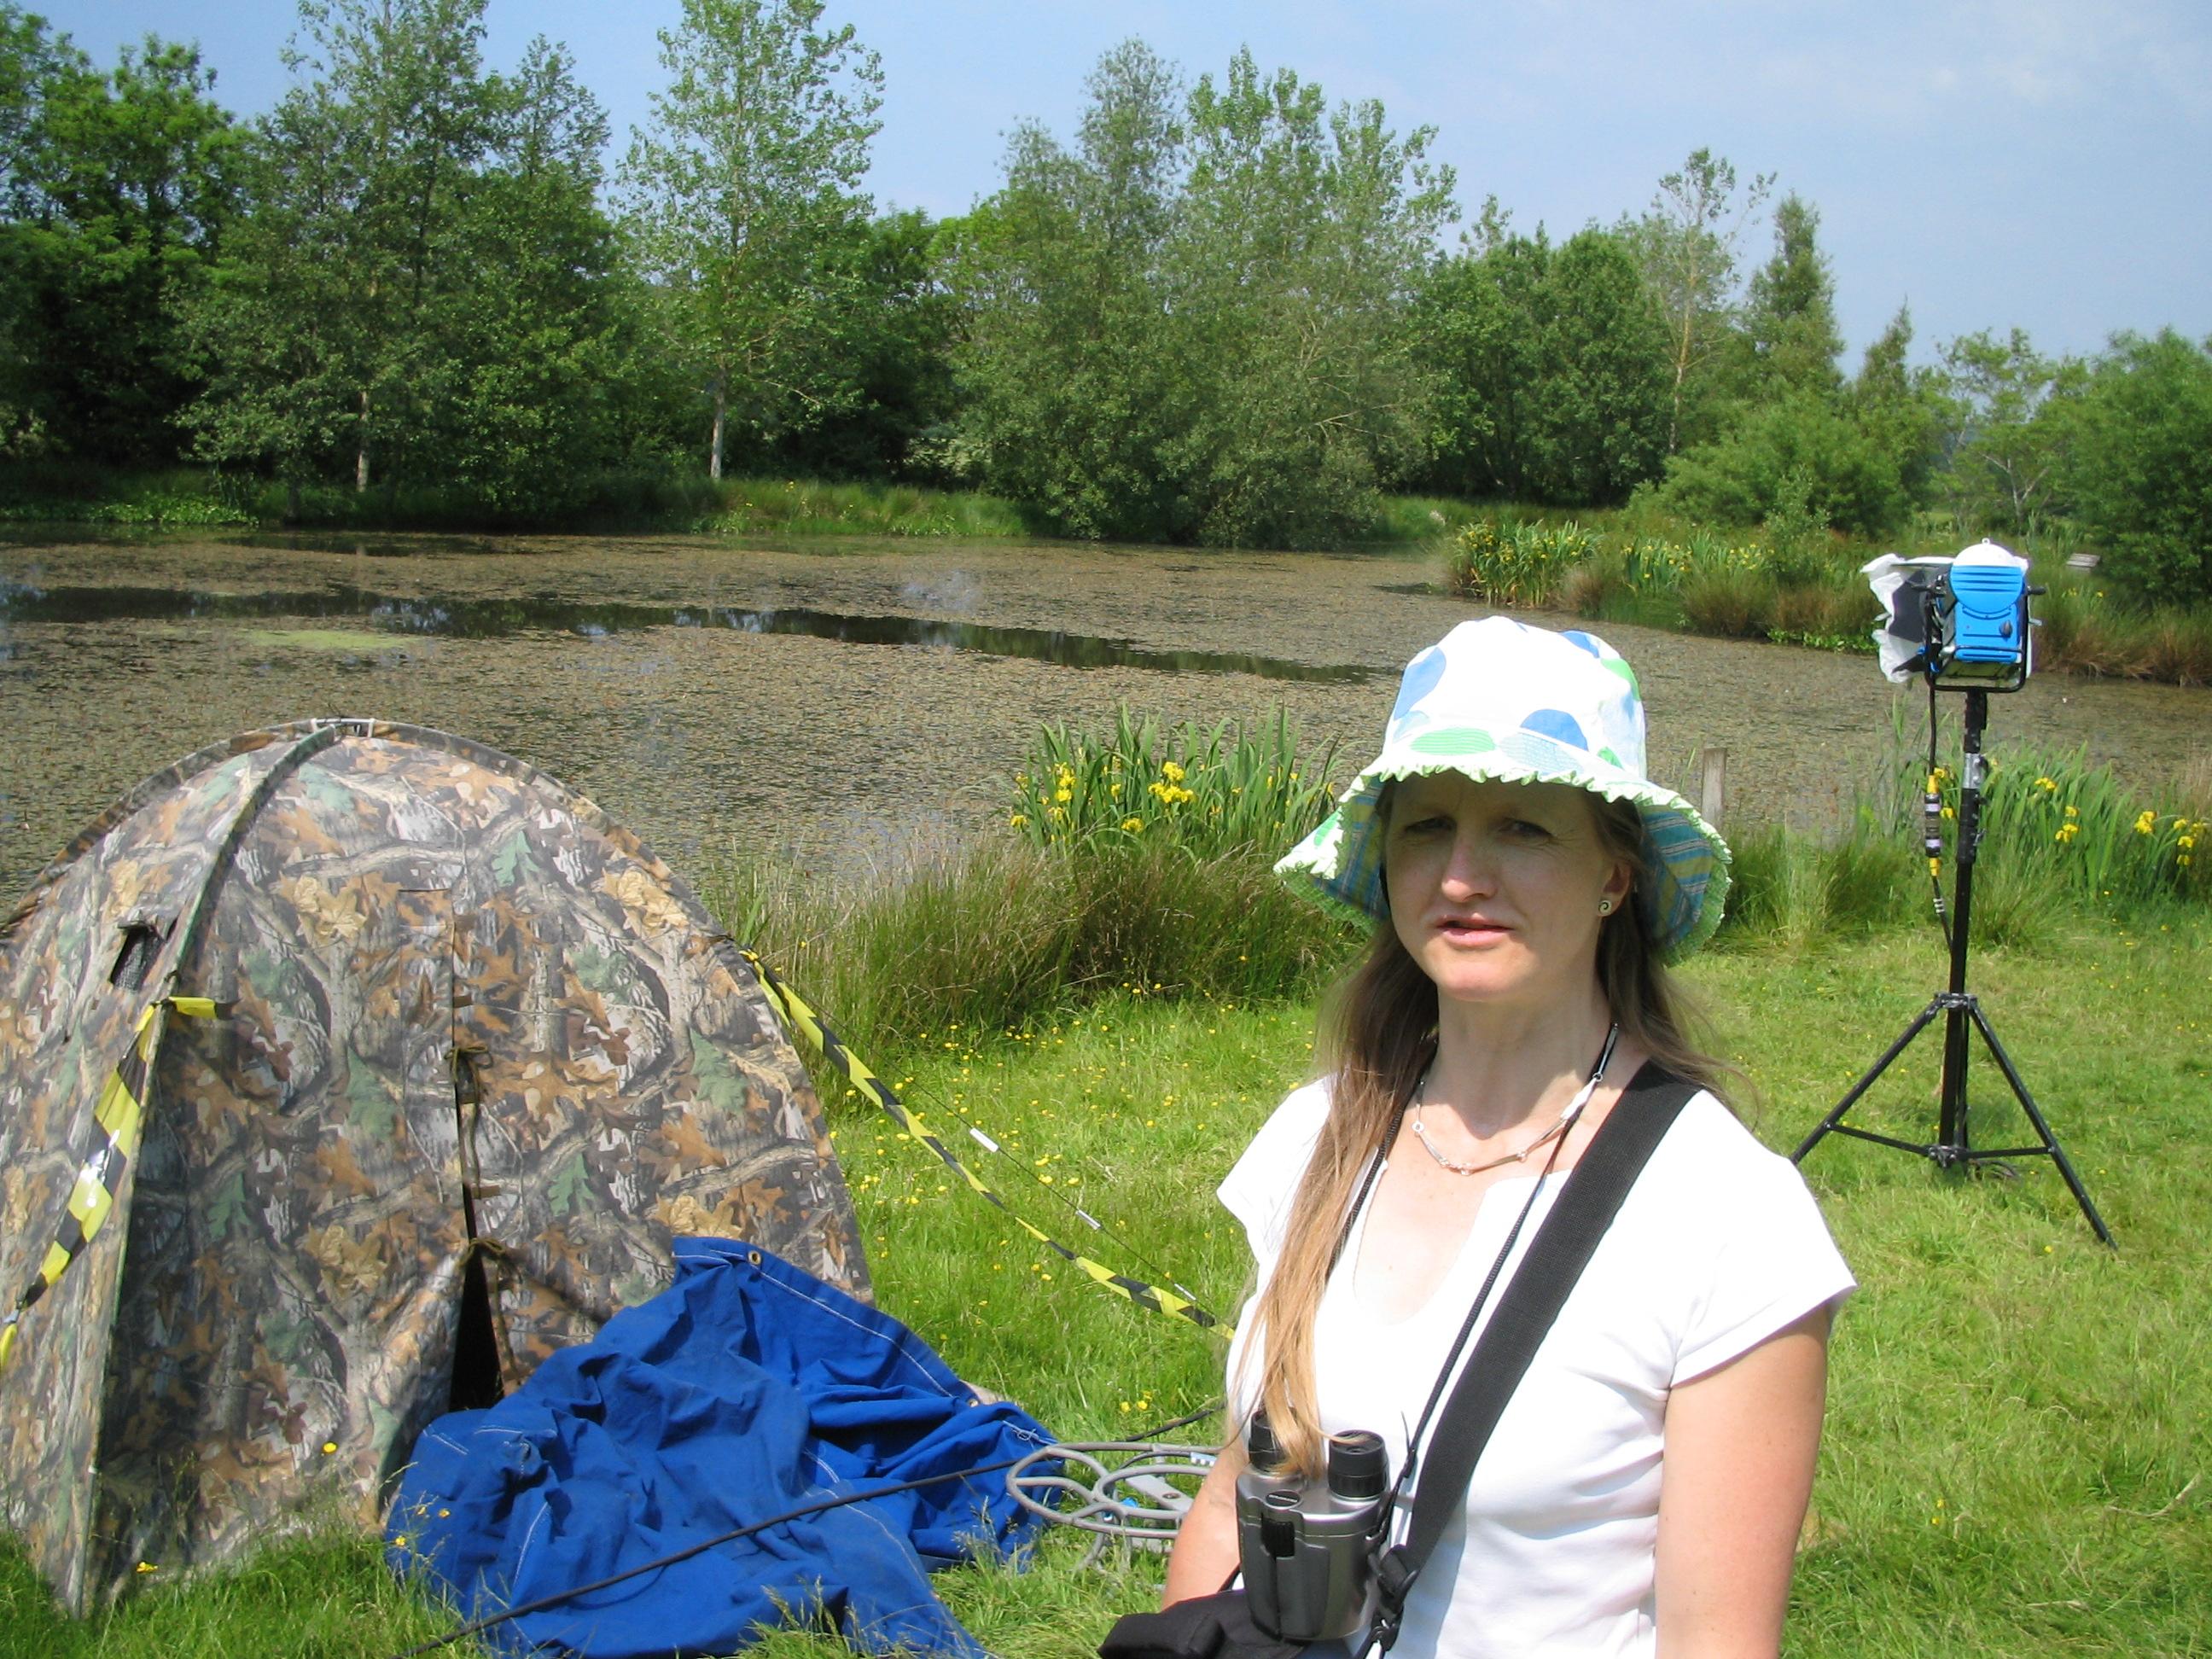 Rebecca Bangay at Springwatch, 2006